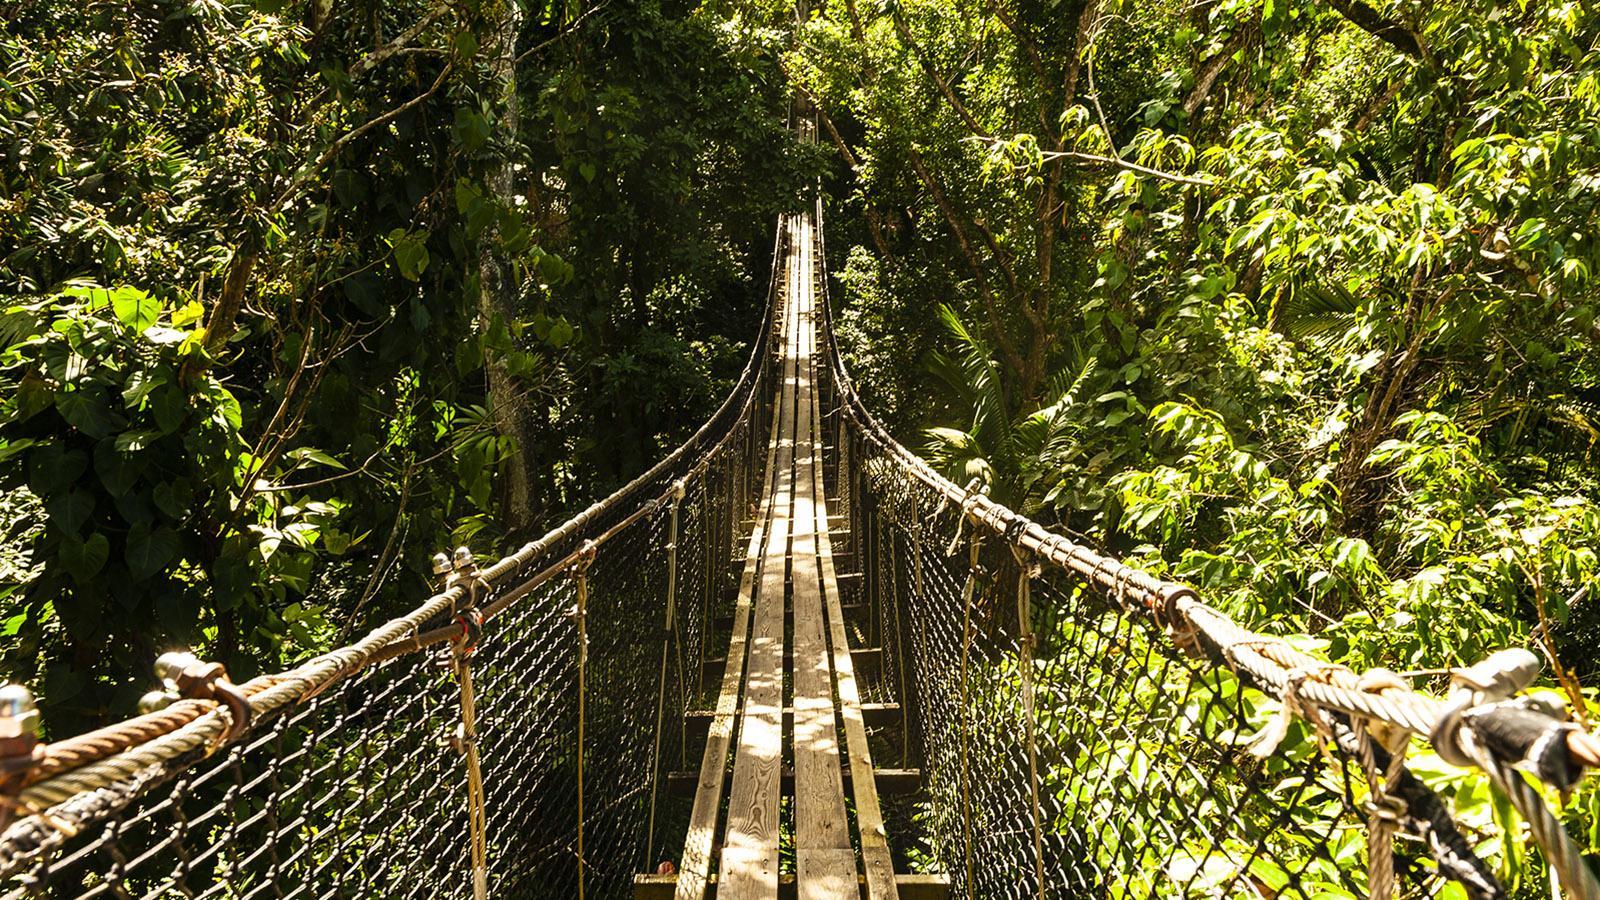 Guadeloupe: Hängebrücke im Zoo